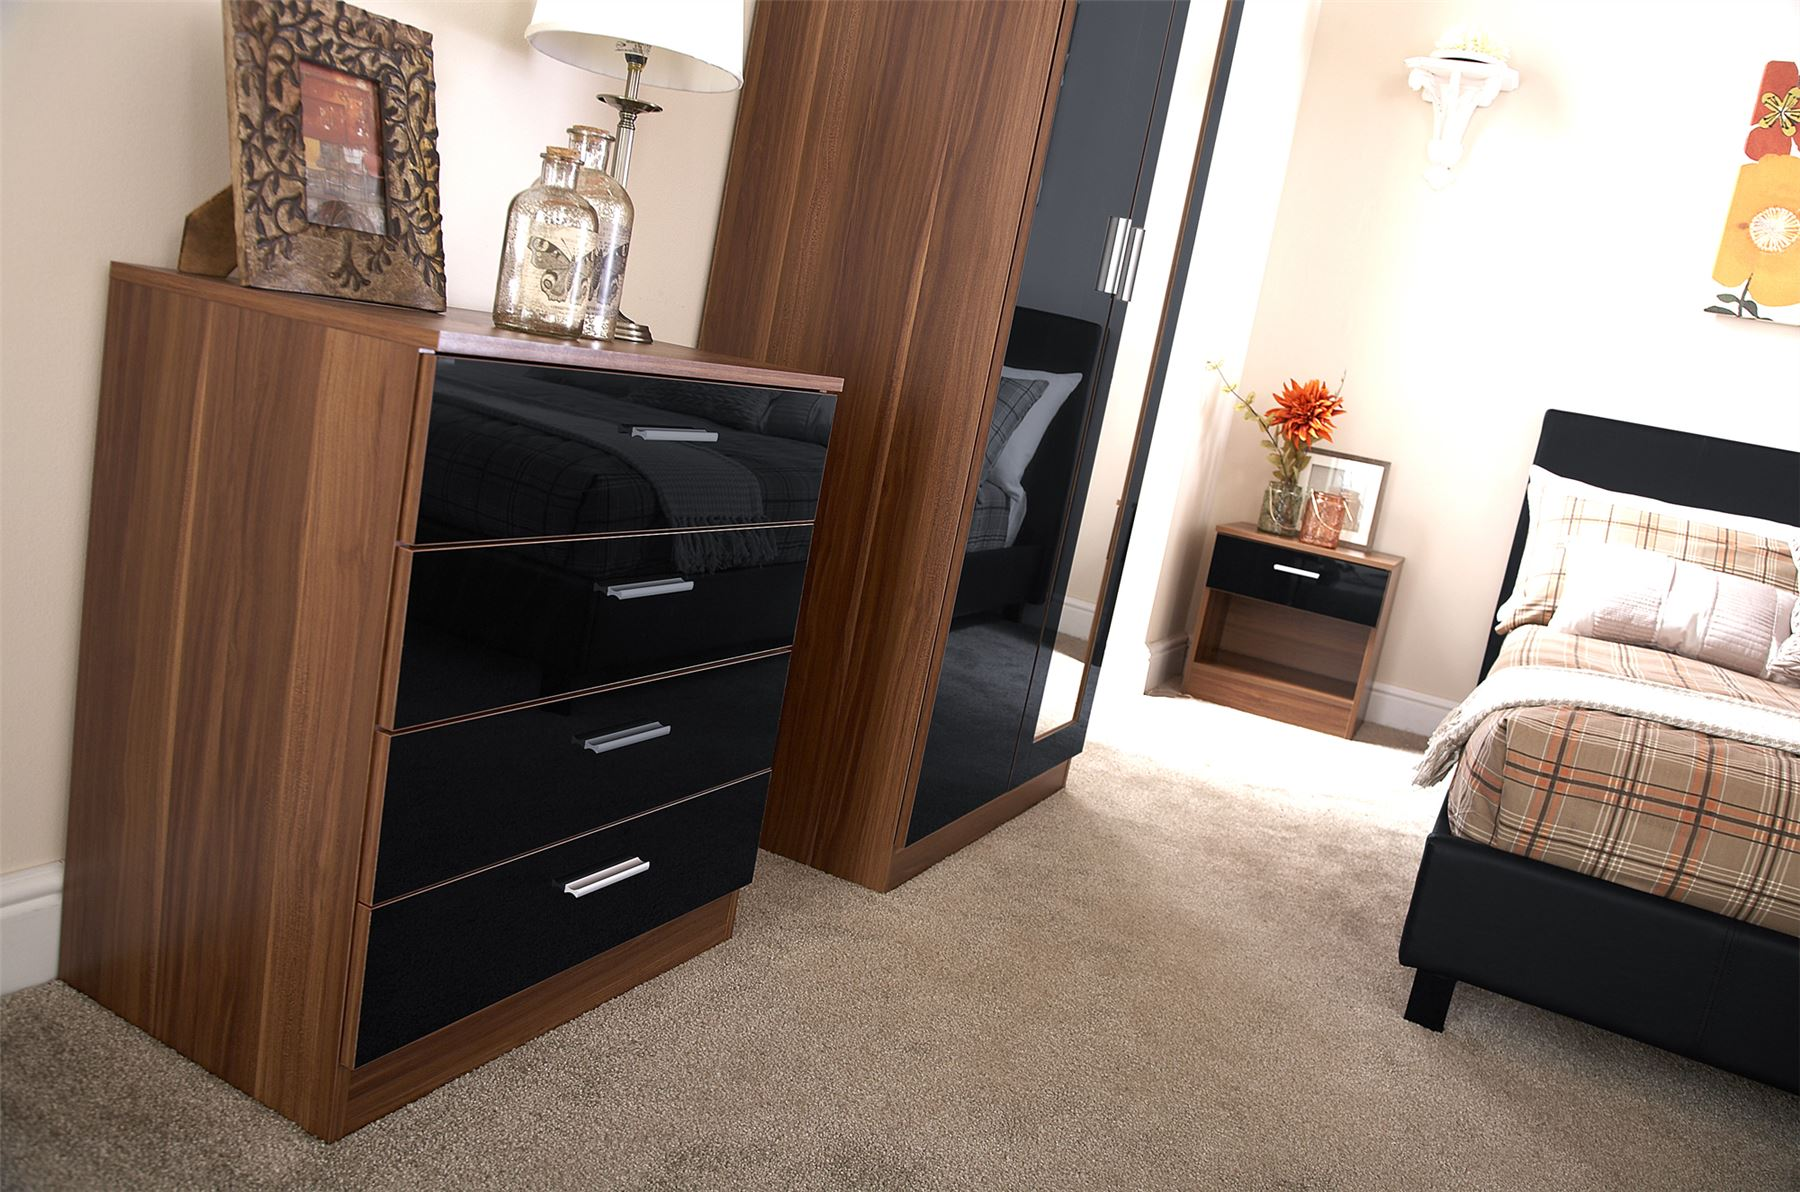 bedroom furniture black gloss. bedroomfurniture3piecesetblackglossamp bedroom furniture black gloss